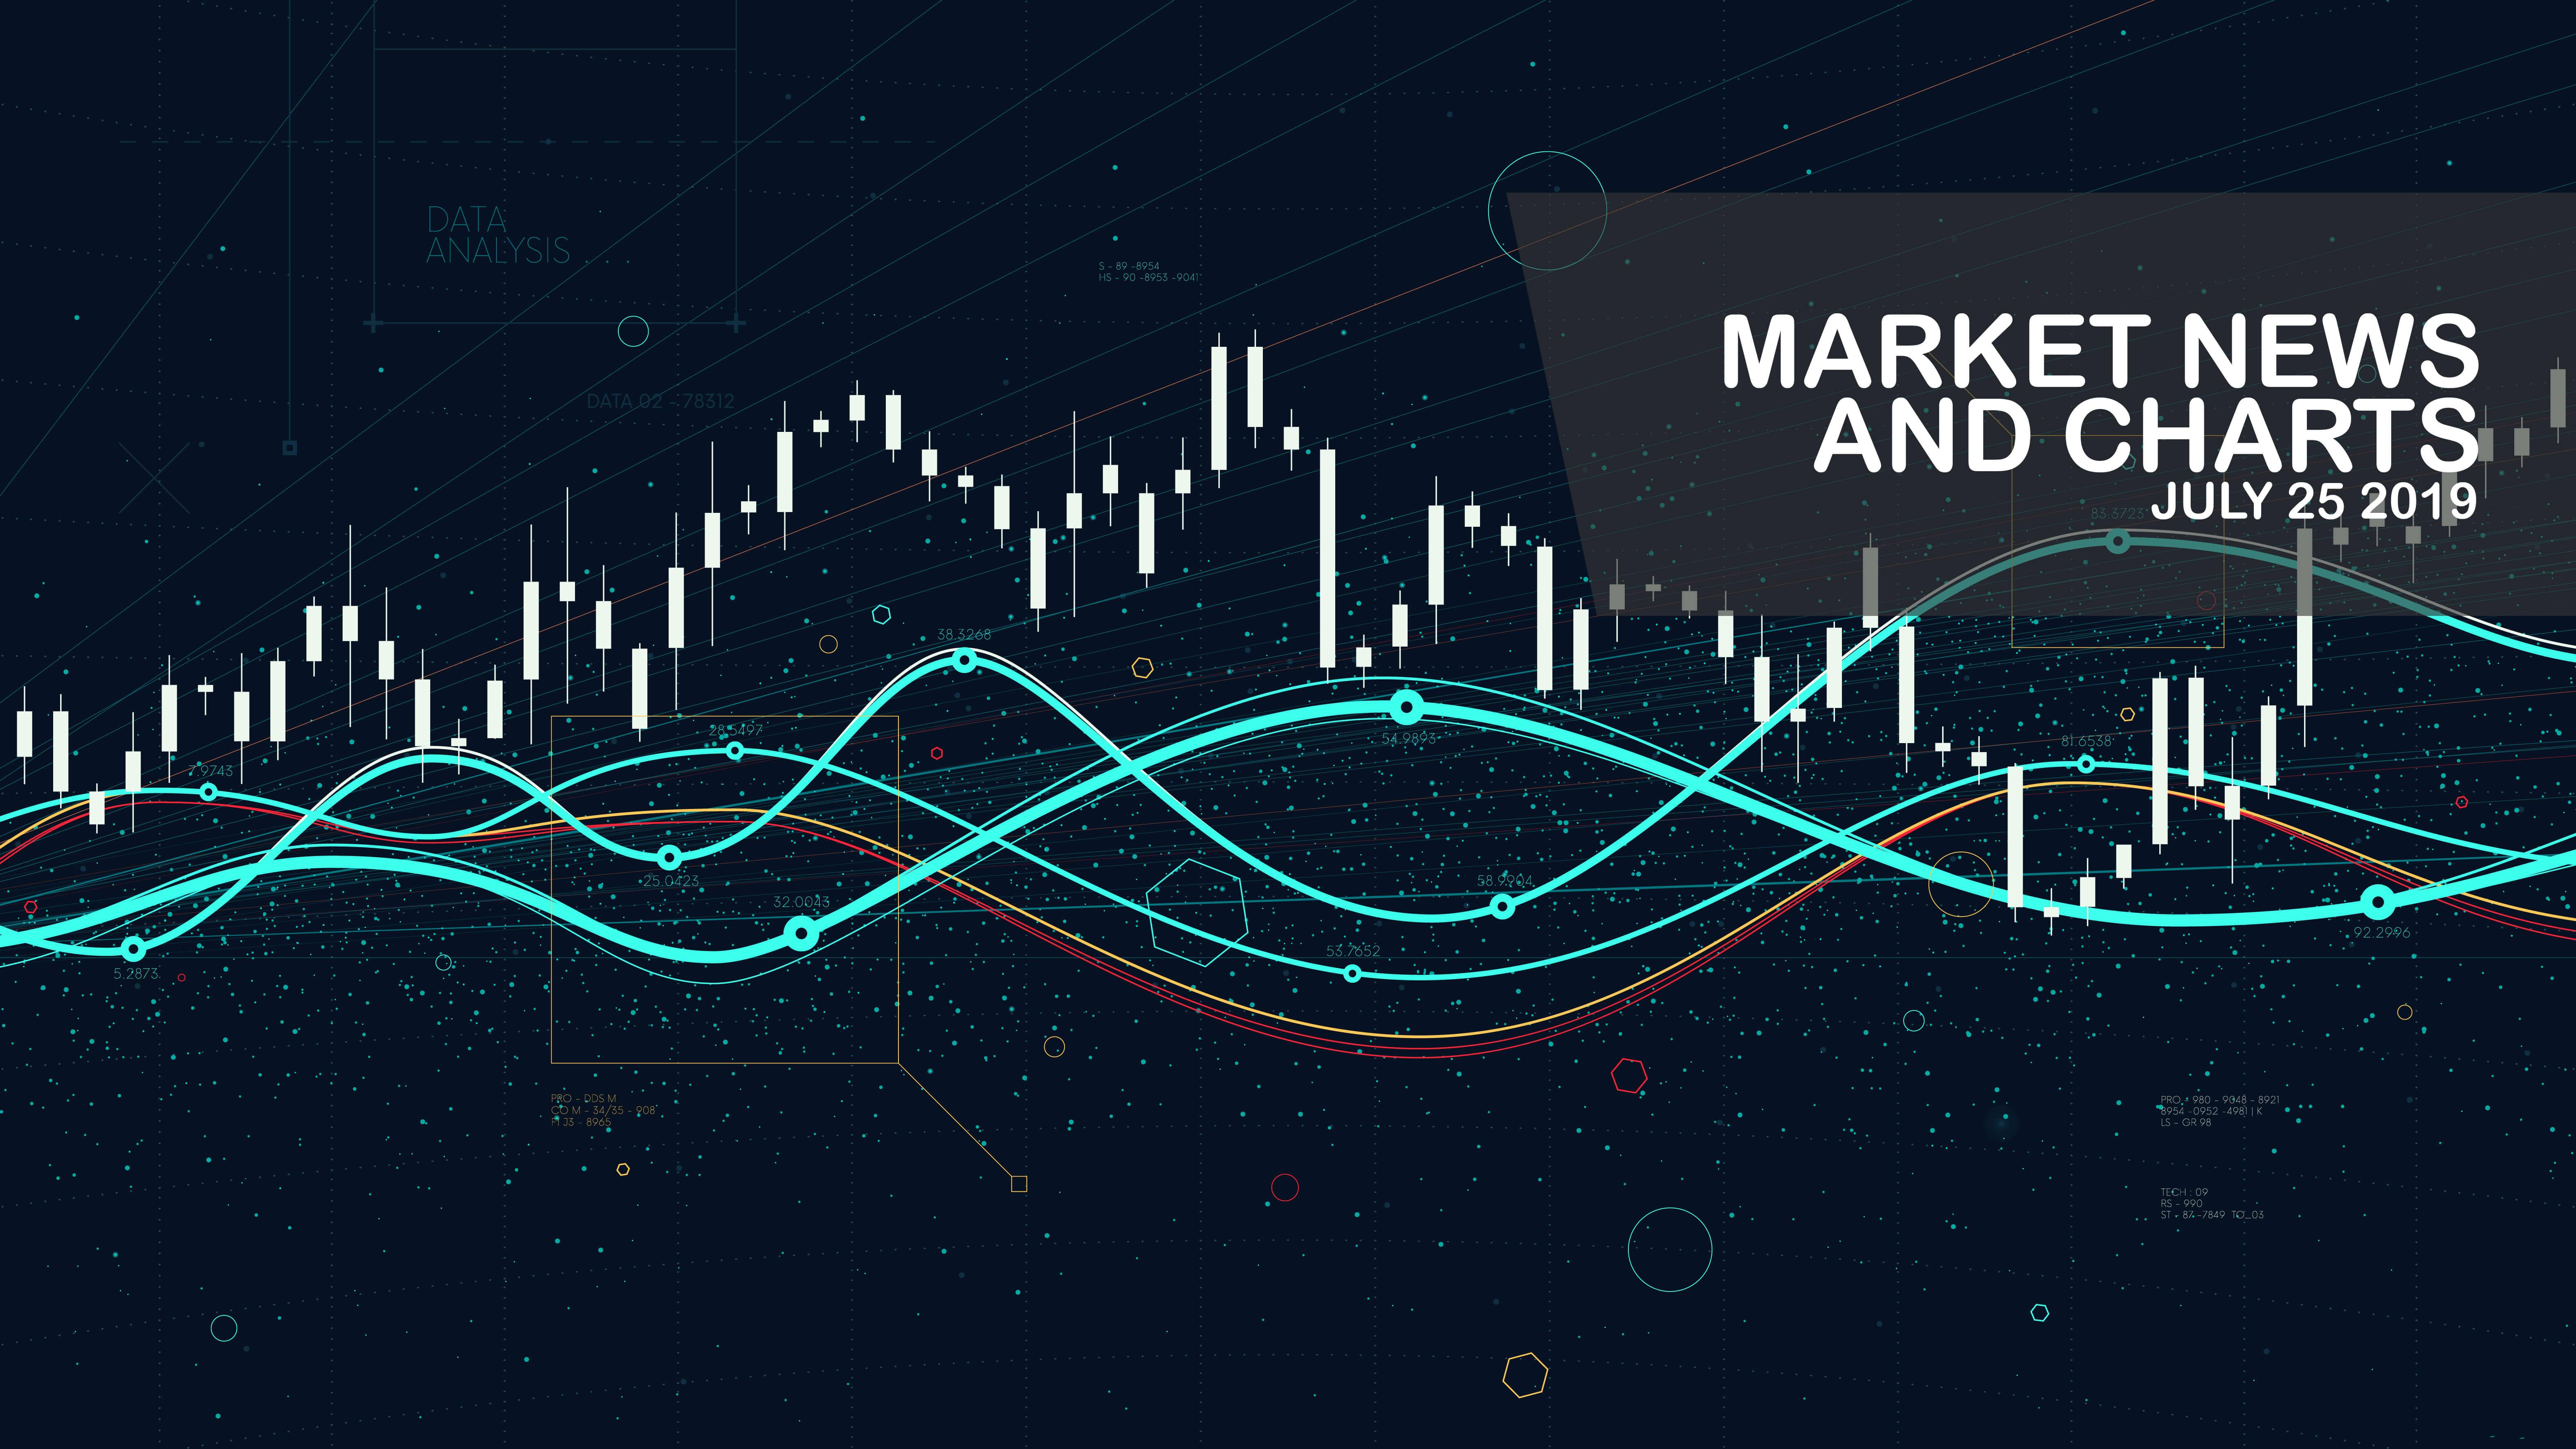 Market-News-and-Charts-July - 25-2019-Finance-Brokerage-1